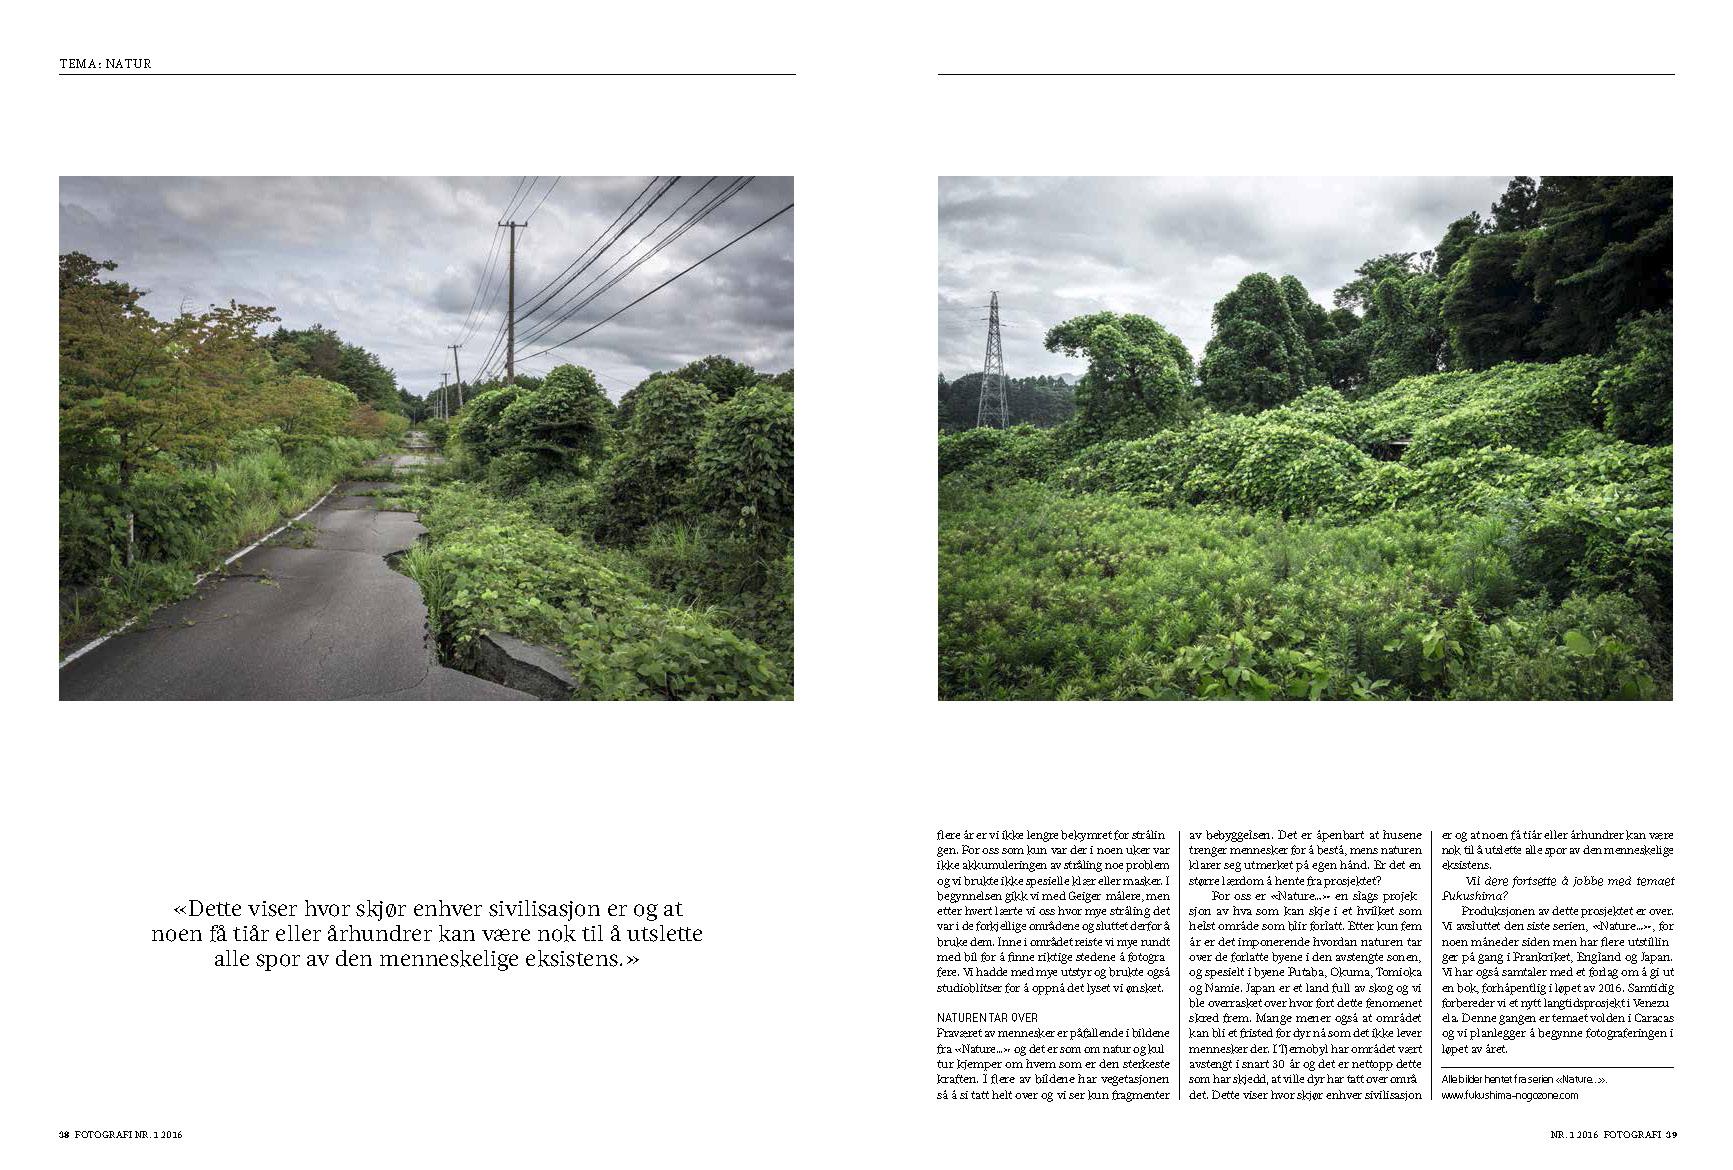 Fotografi-34-39-2_Page_3